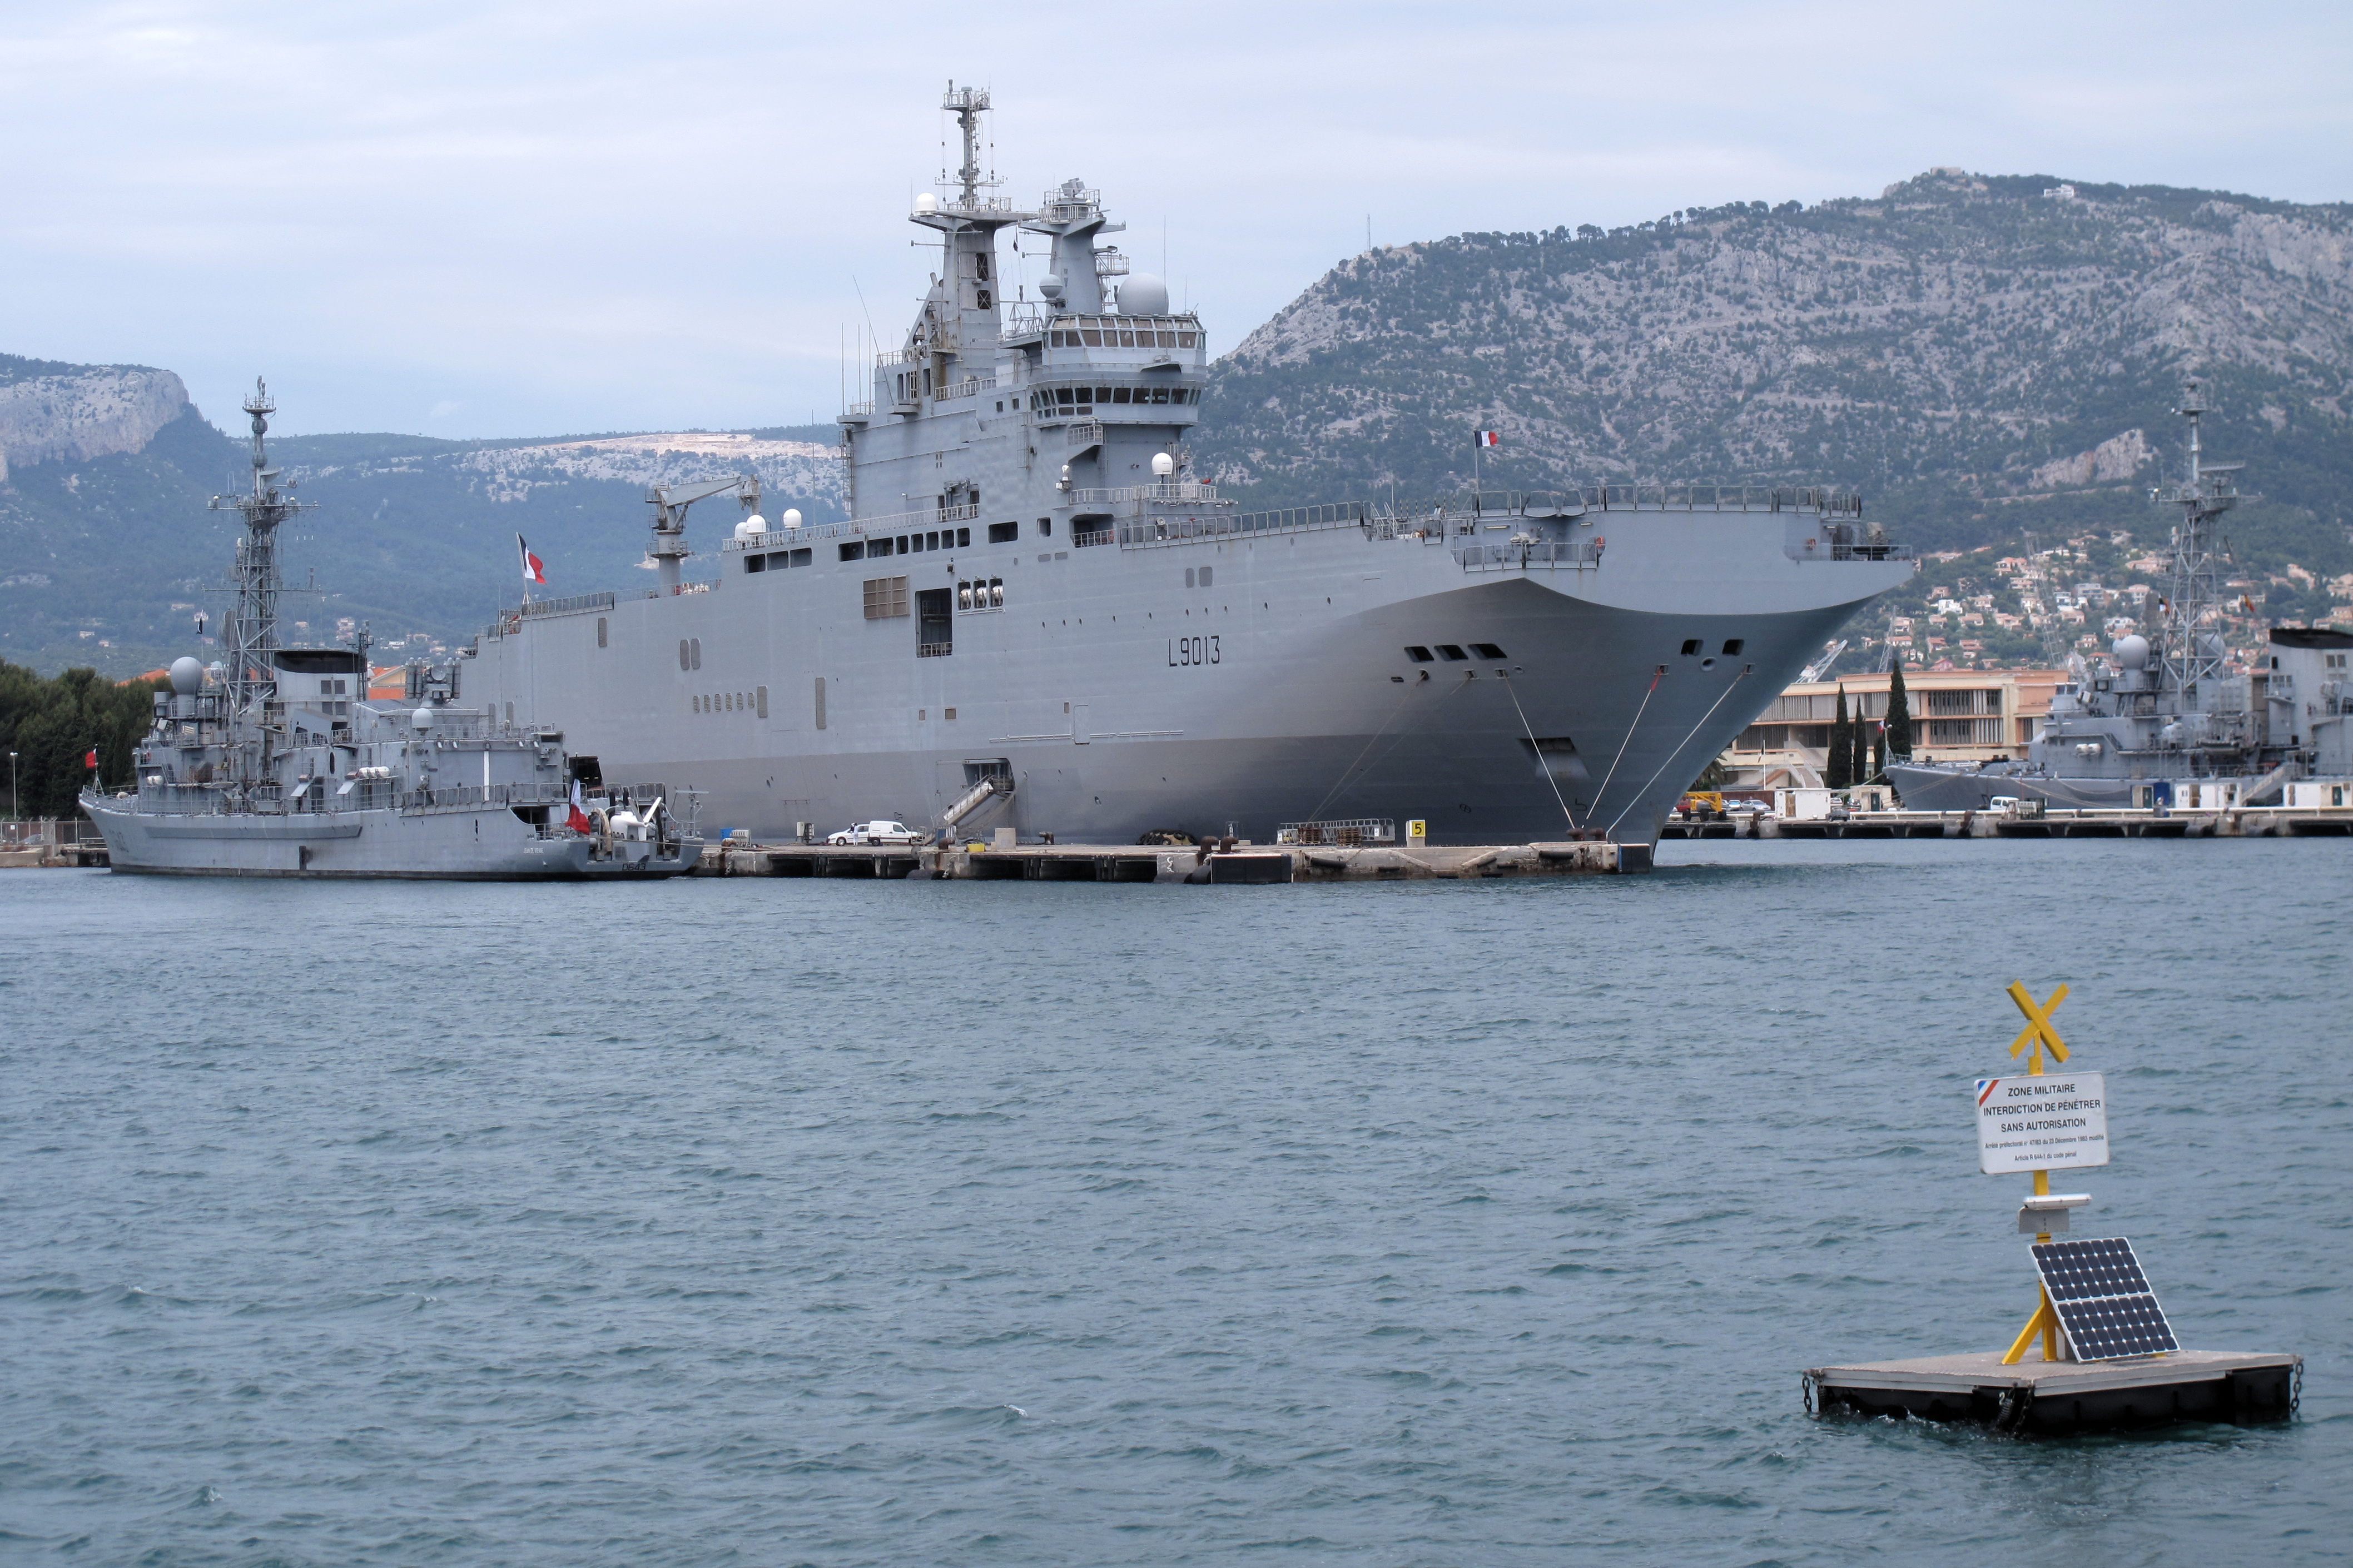 File:Mistral IMG 6863 JPG - Wikimedia Commons